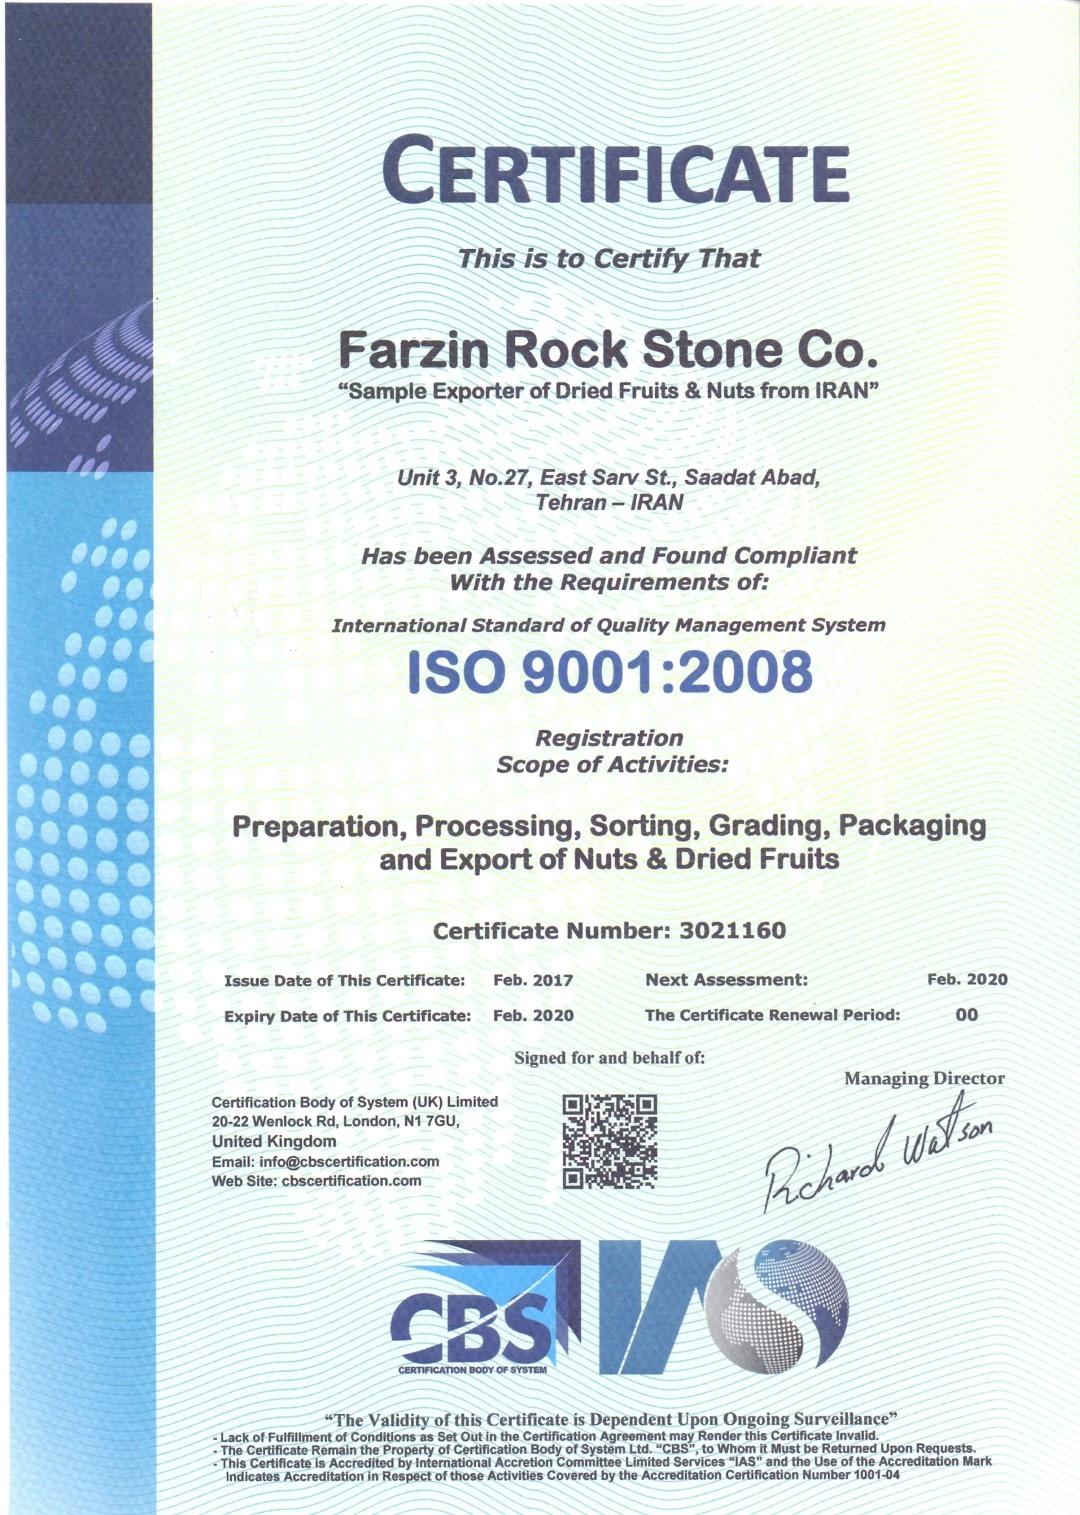 Iran Fresh Fruits ISO 9001:2008 Certificate